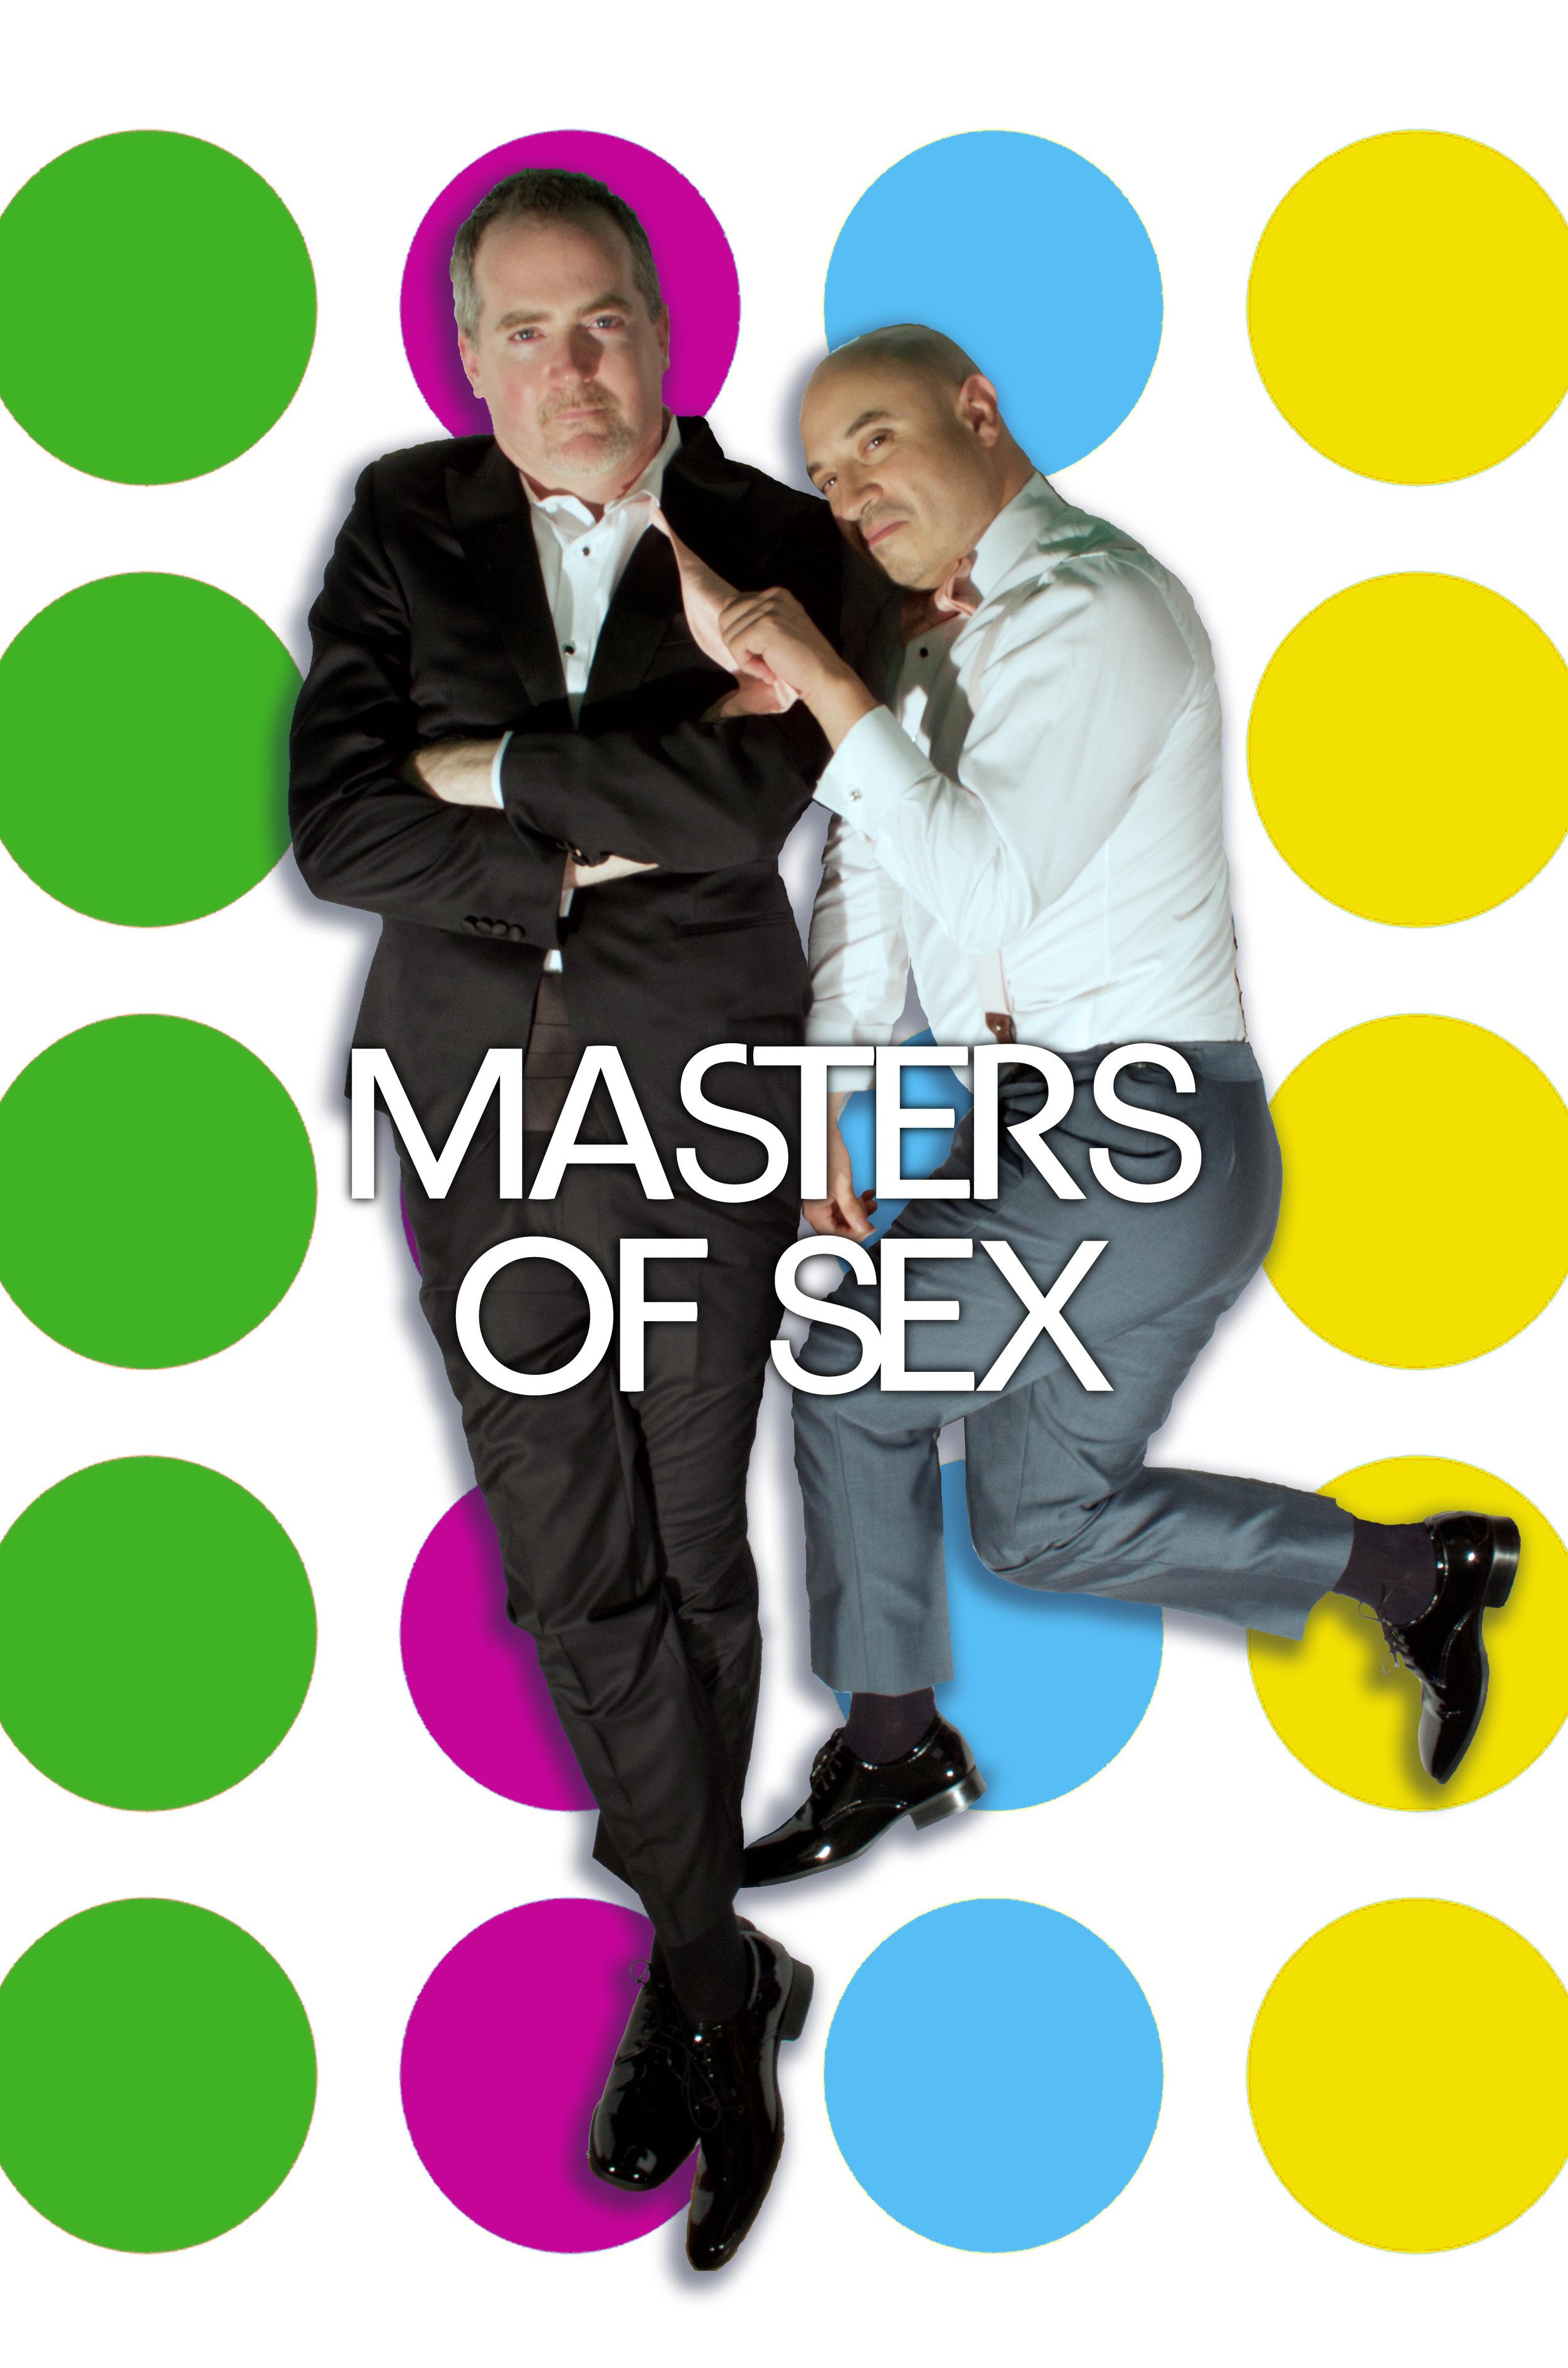 MastersOfSex.jpg